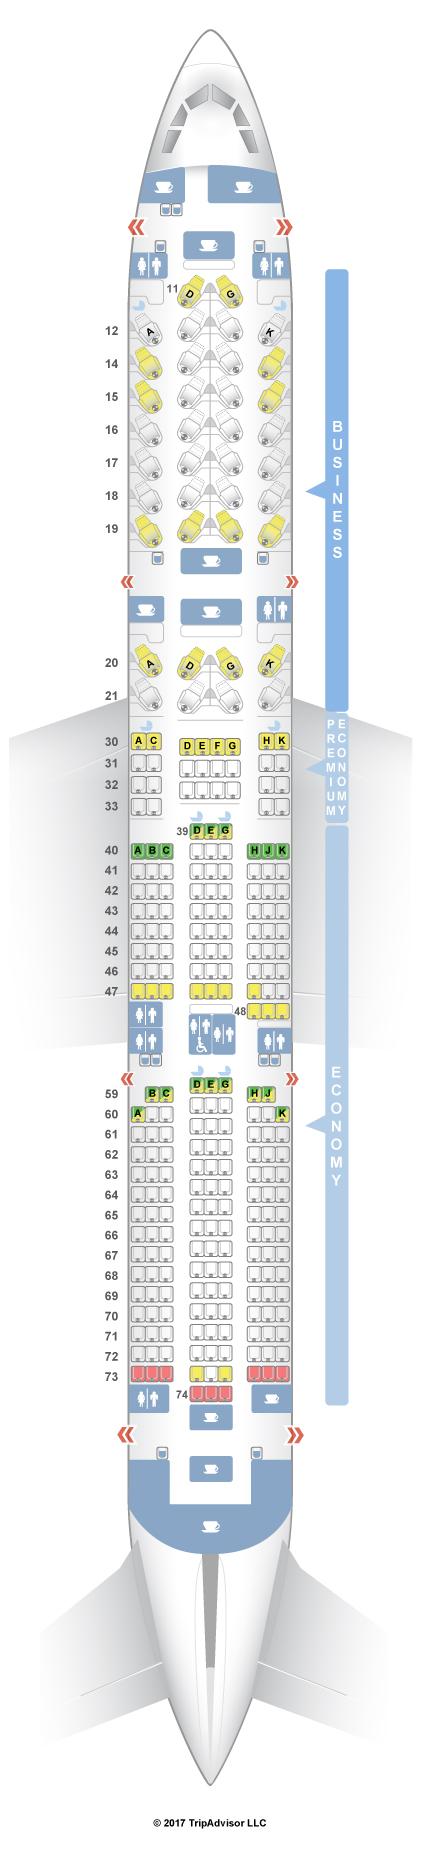 SeatGuru Seat Map Cathay Pacific - SeatGuru